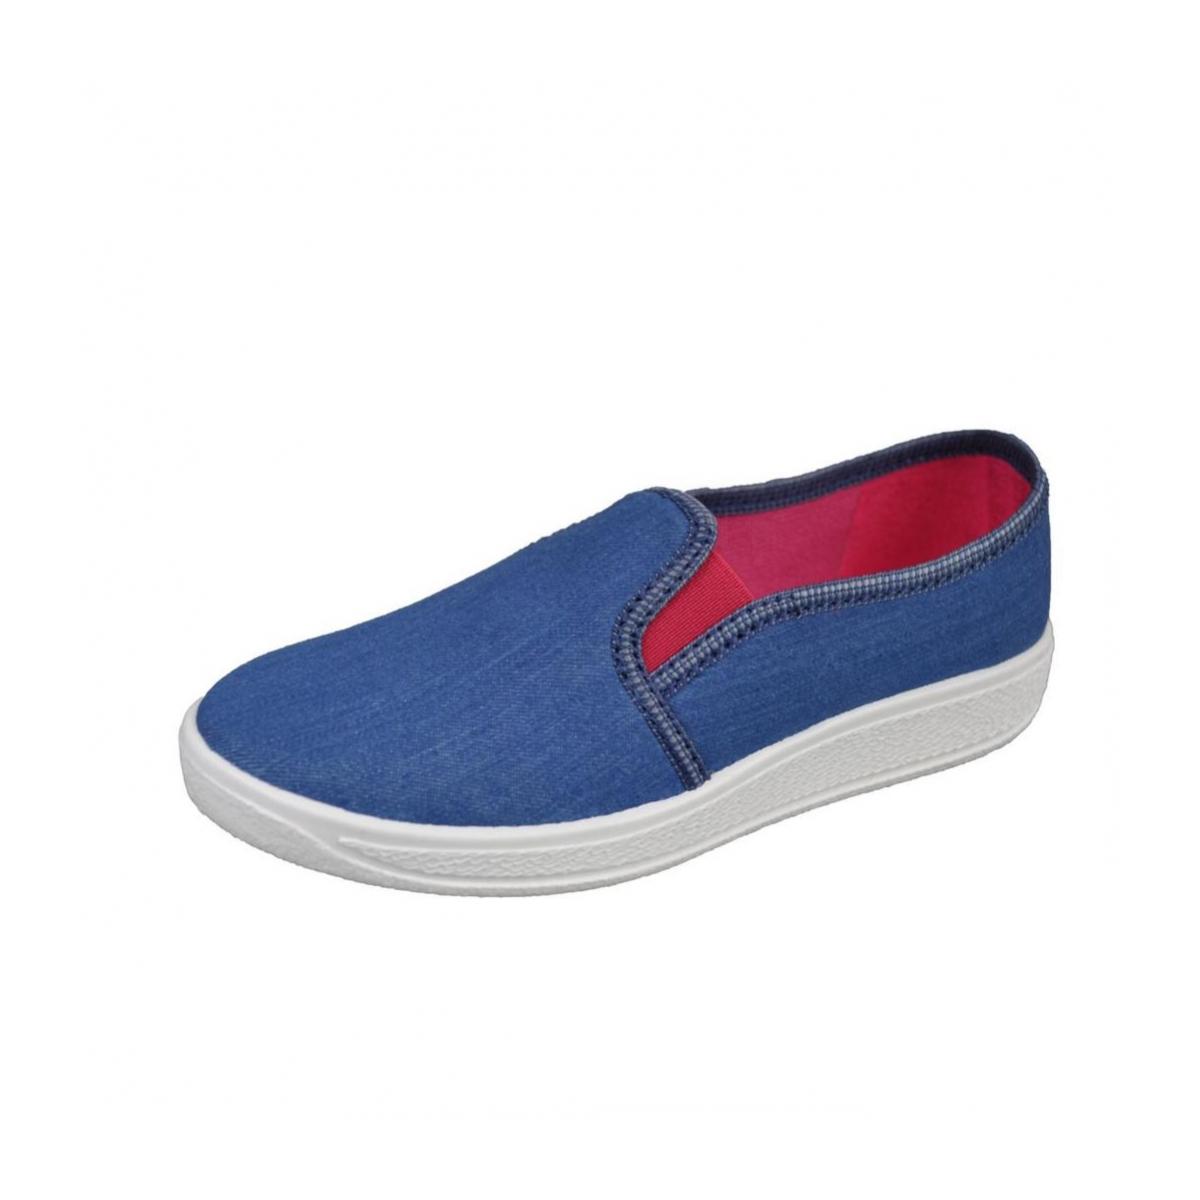 bd2c7f442f615 Detské modré topánky ANDREA | Johnc.sk